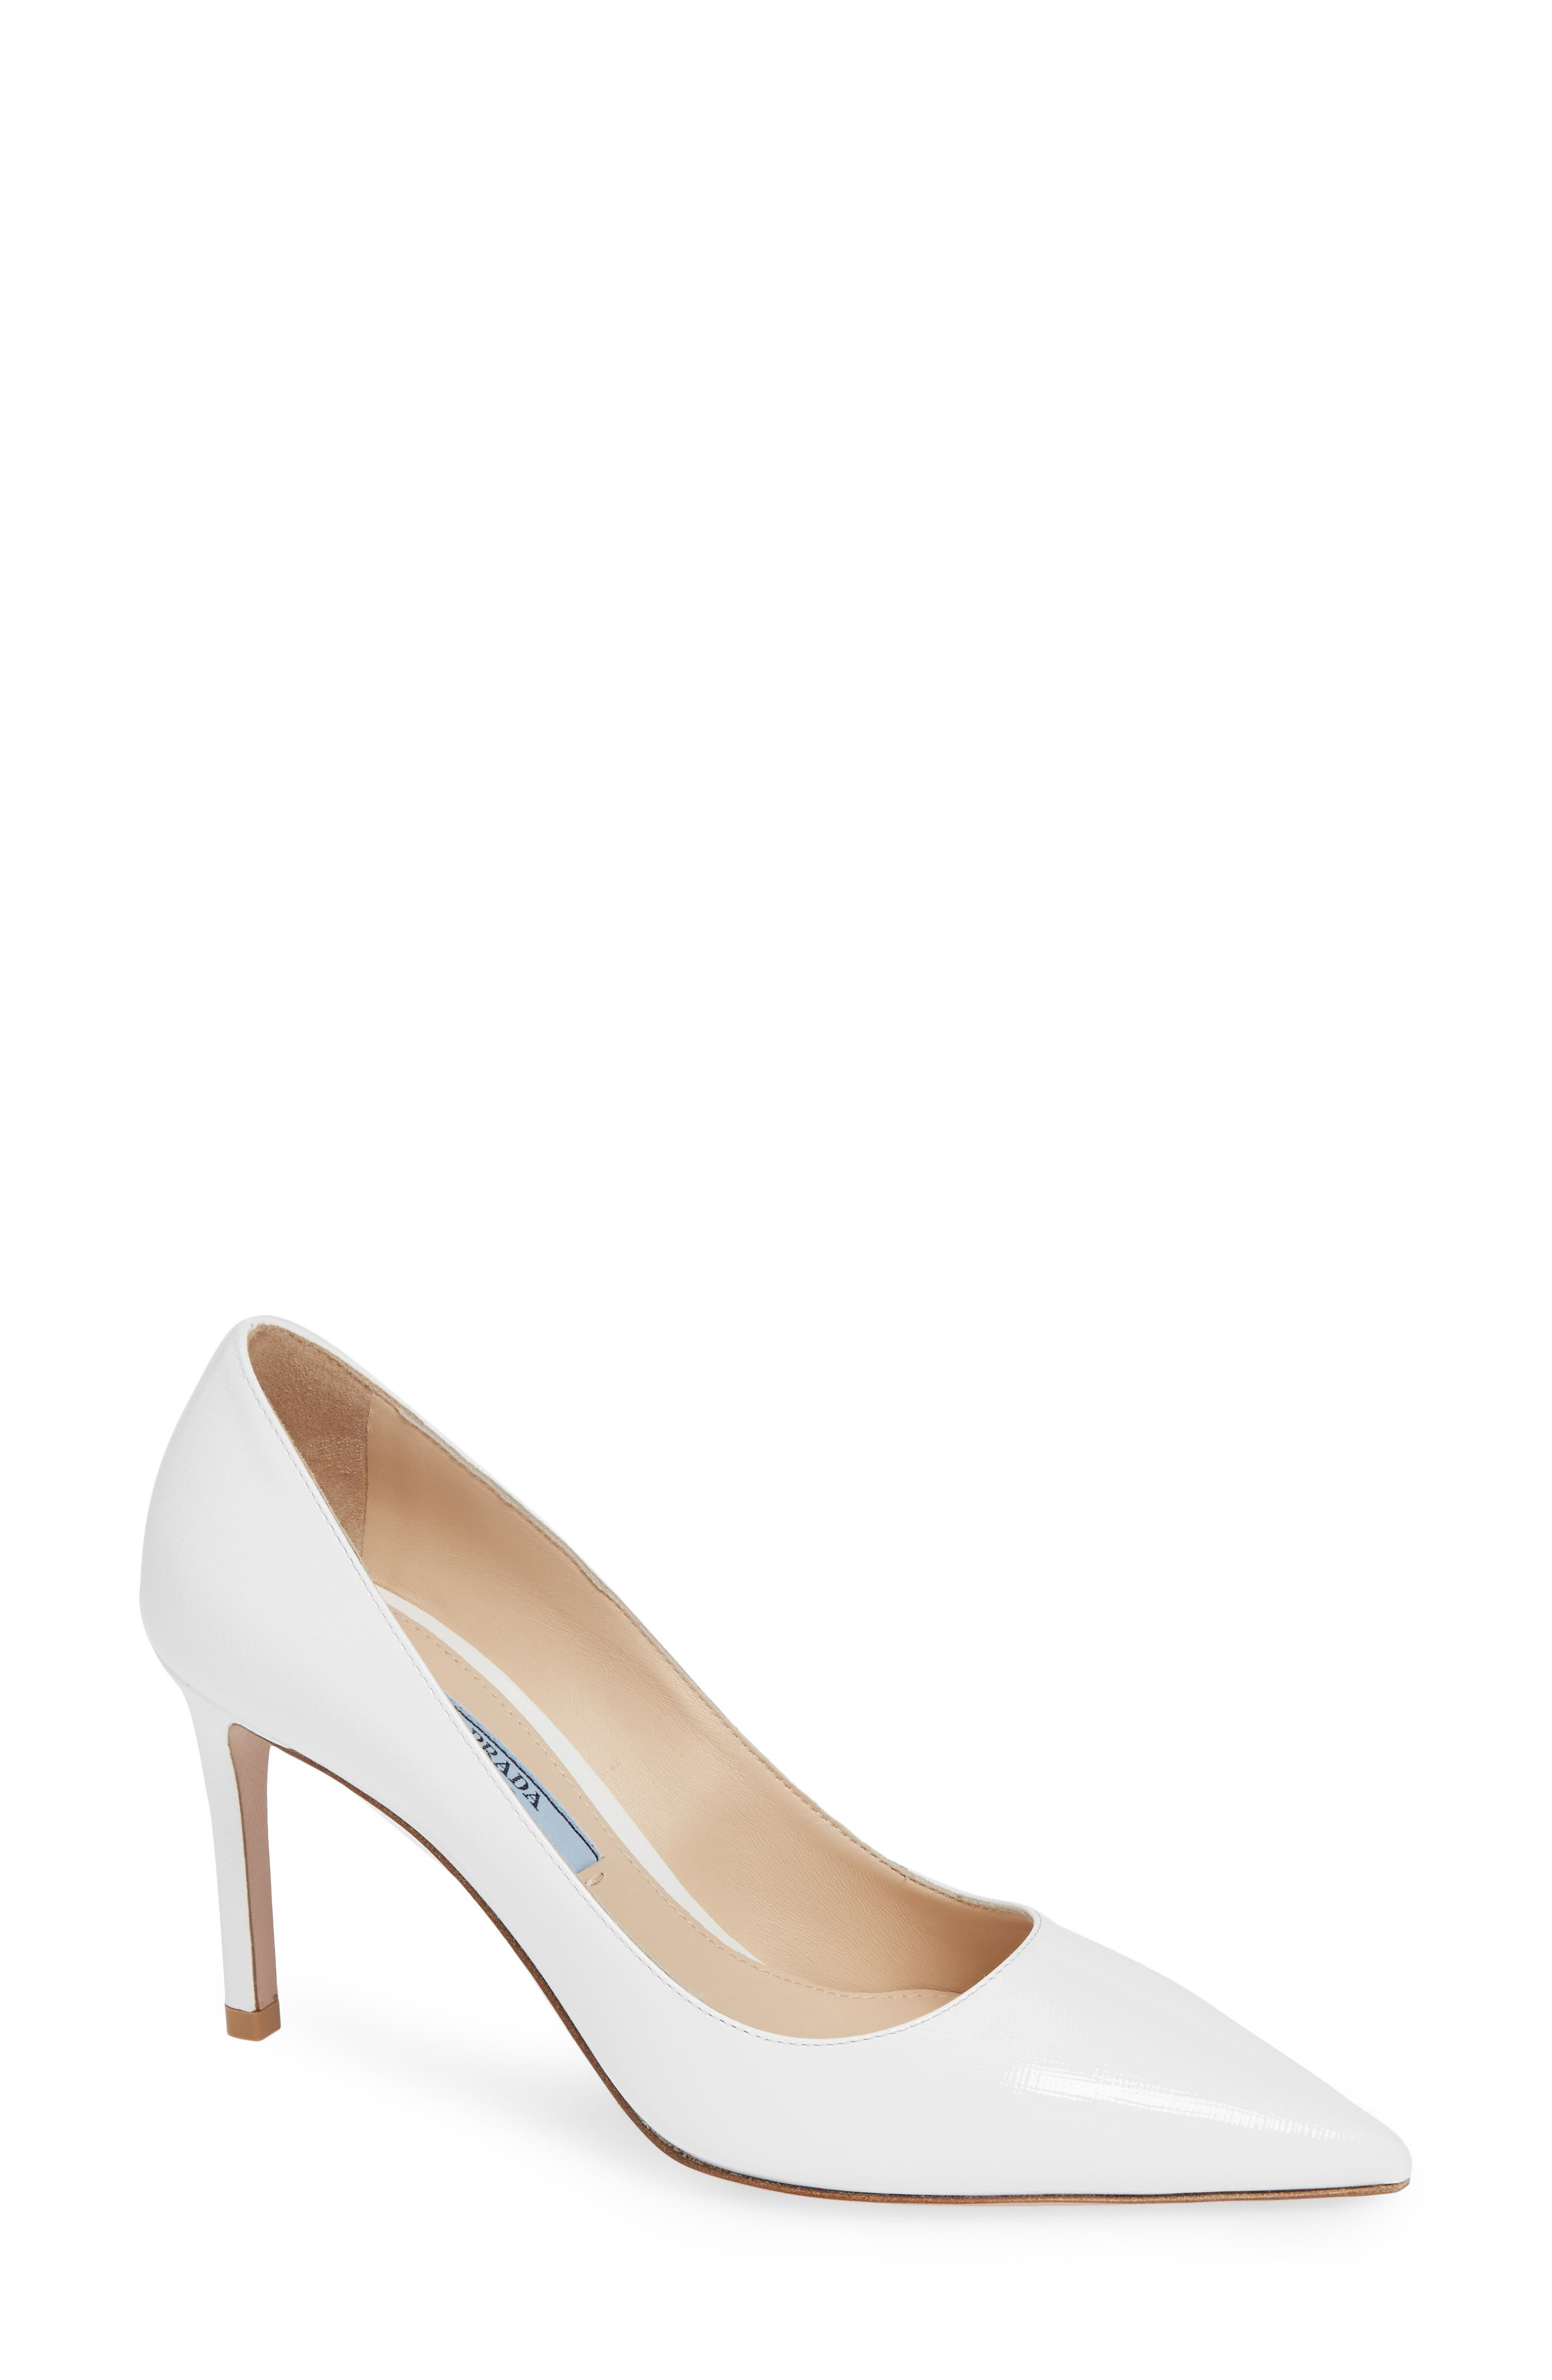 Prada Shoes Women's Nordstrom Prada Women's BqrpWBY